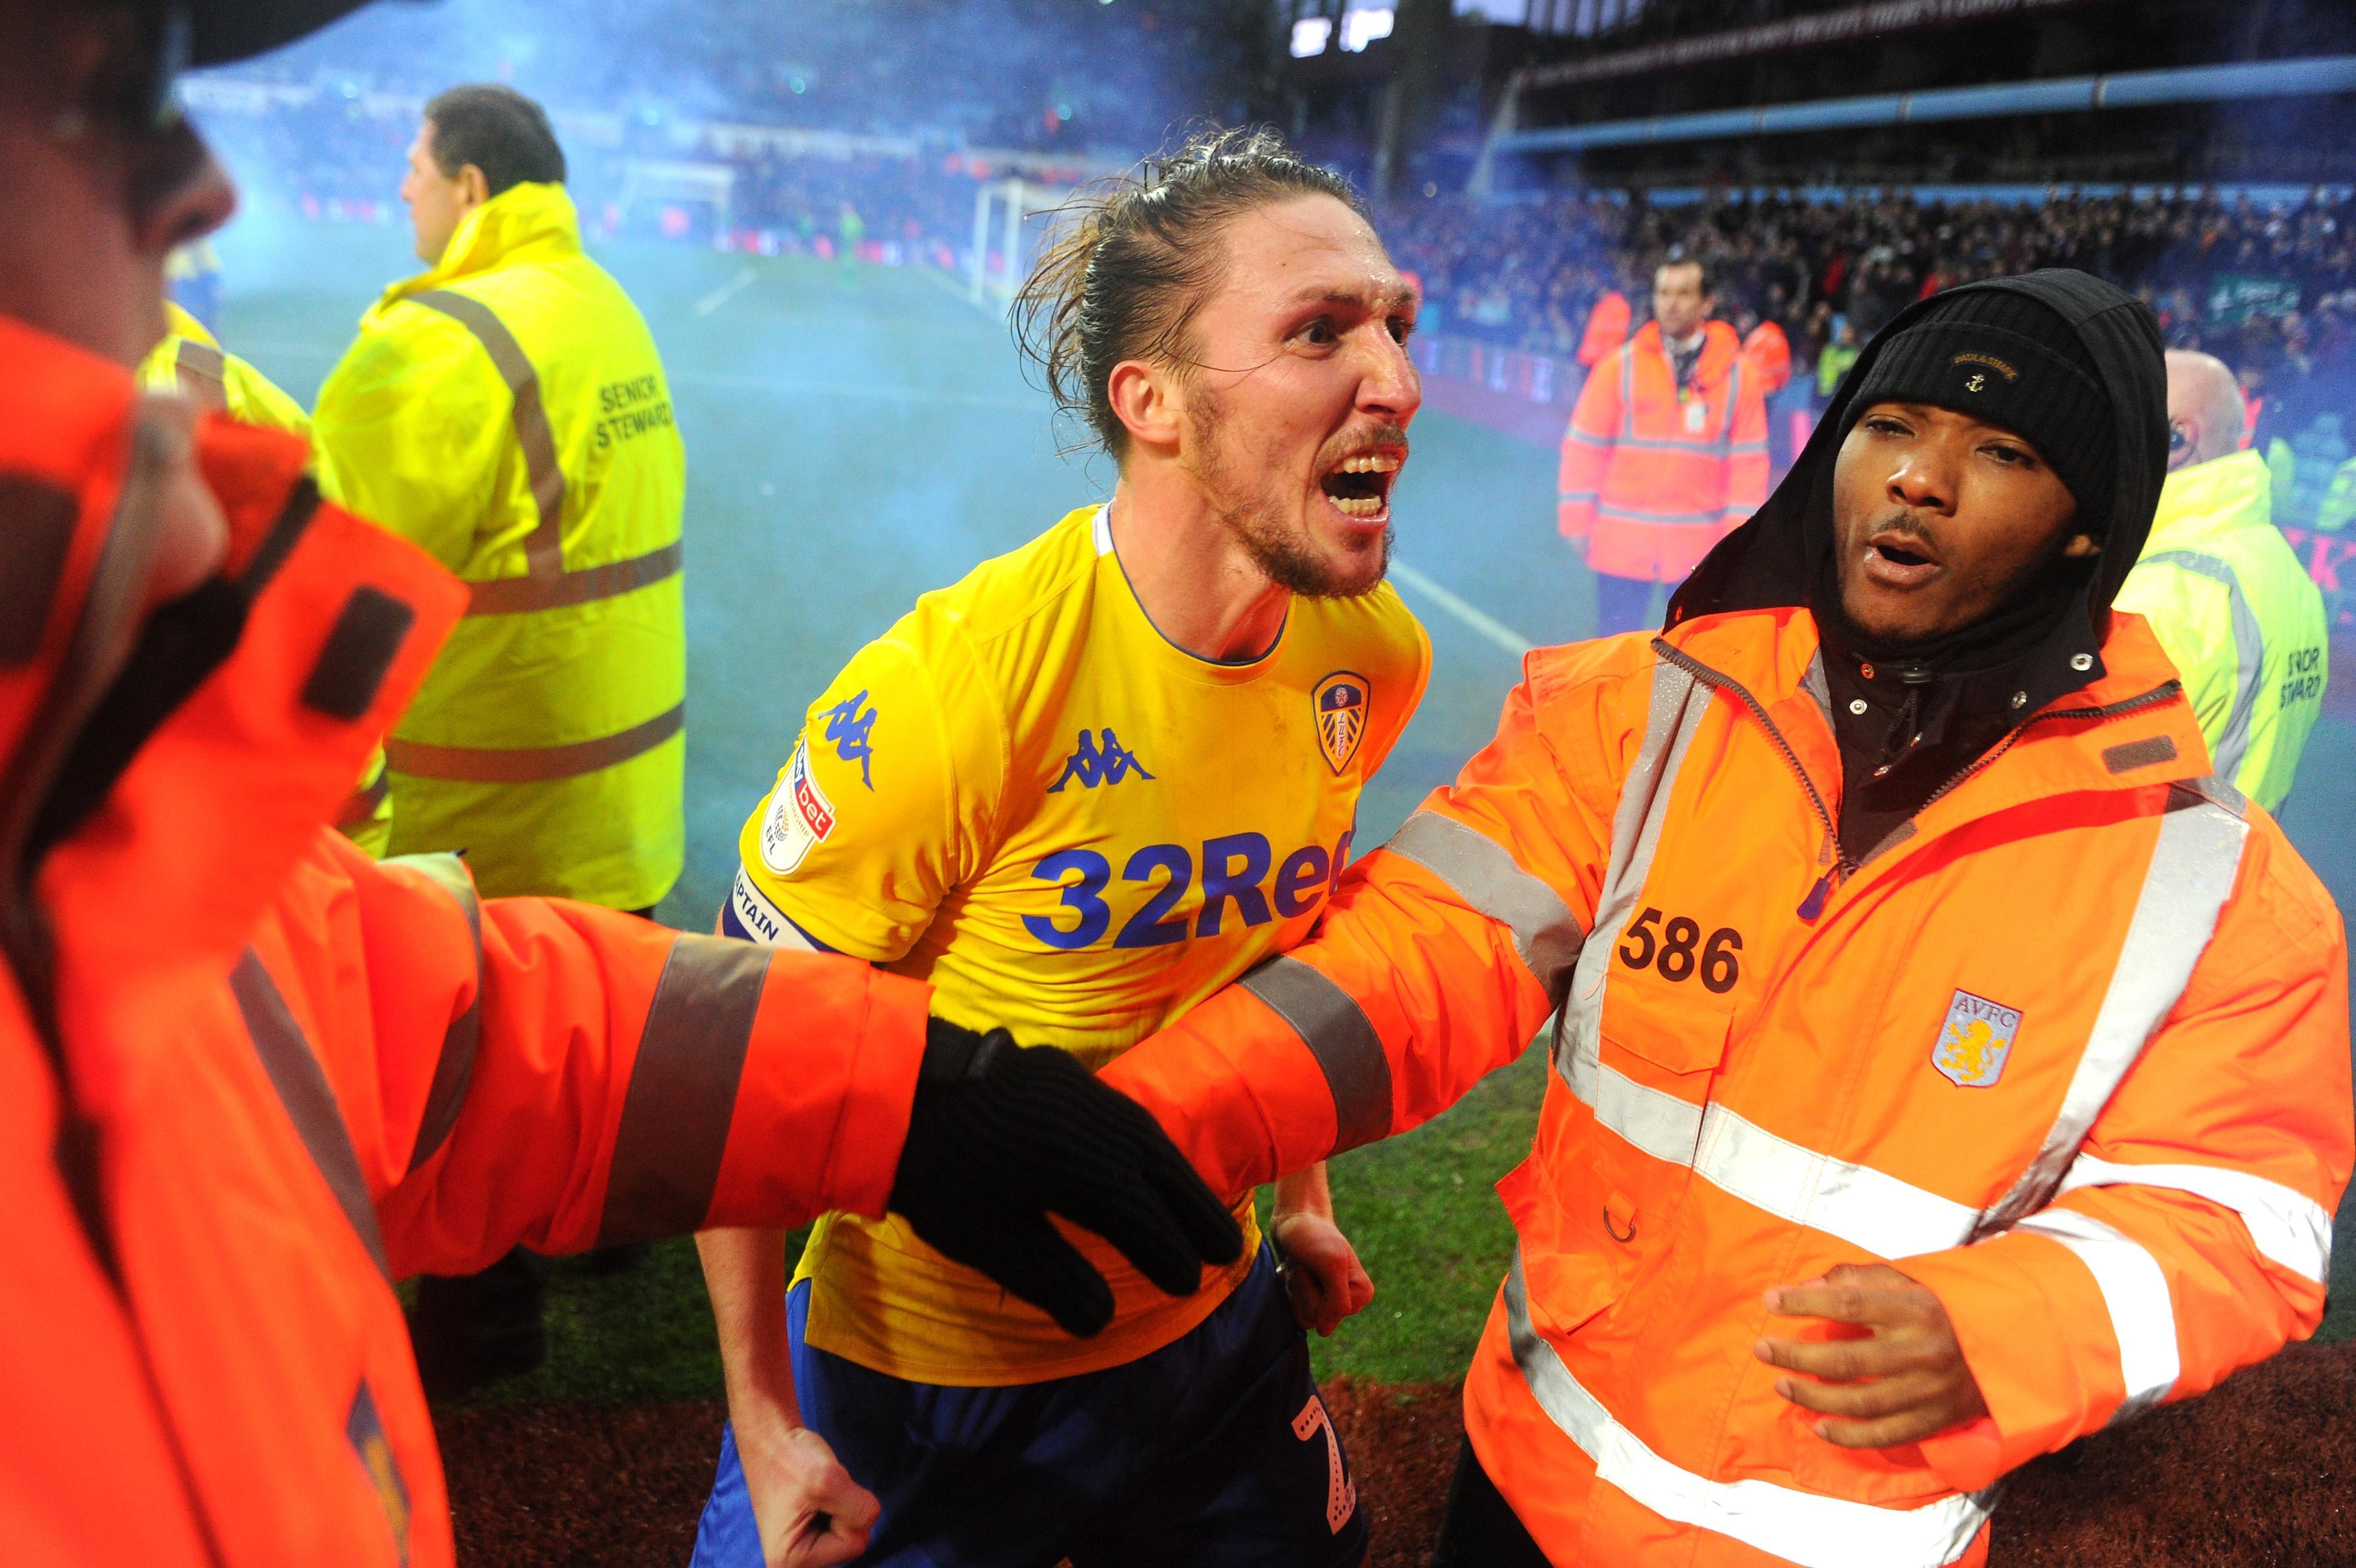 Dramatic wins against Aston Villa and Blackburn were dubbed 'the stuff of champions'